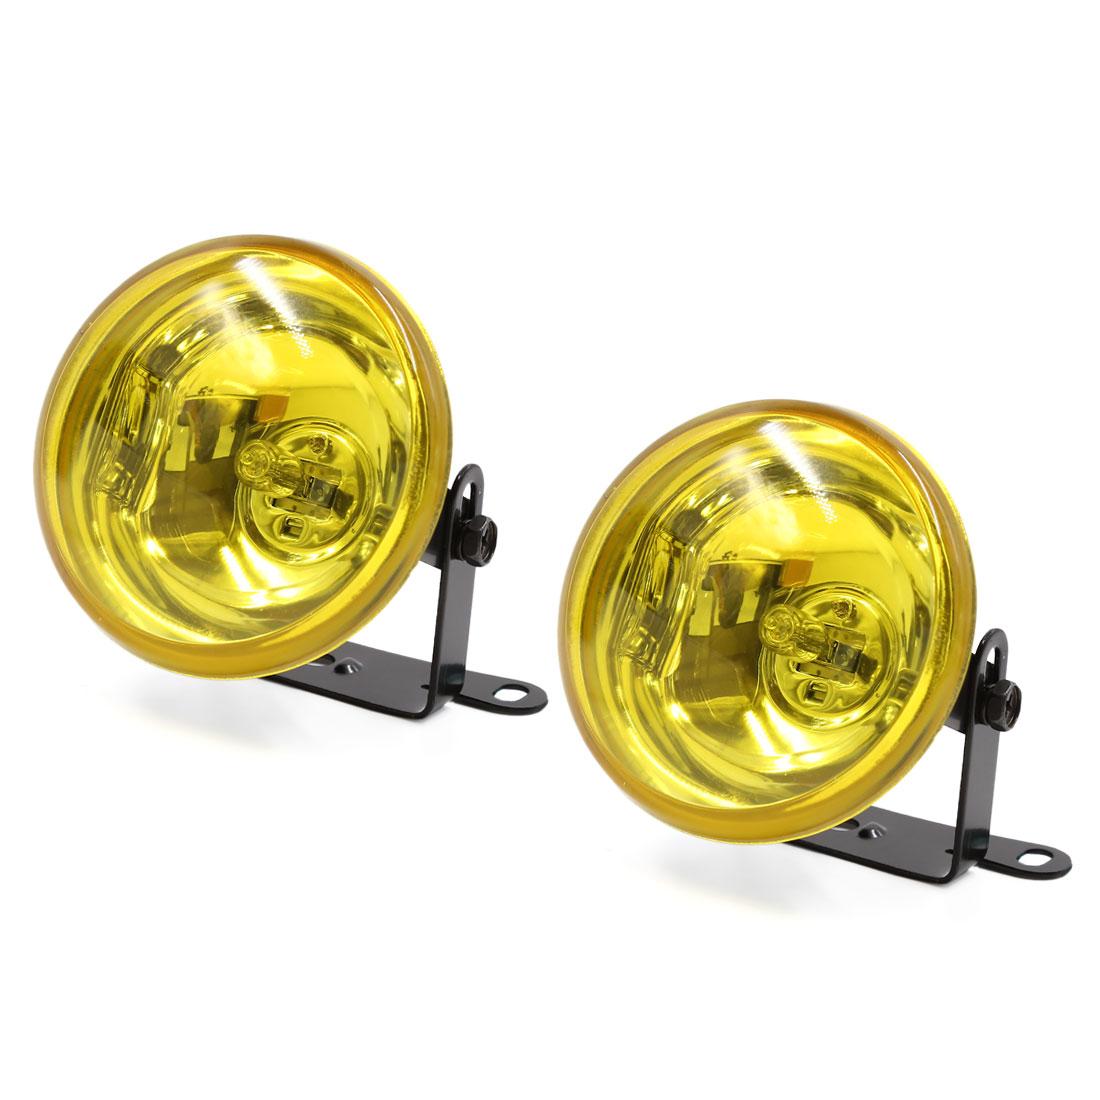 2 Pcs H3 95mm Dia Round Shape Yellow Lamp Car Xenon Fog Light DC 12V 55W